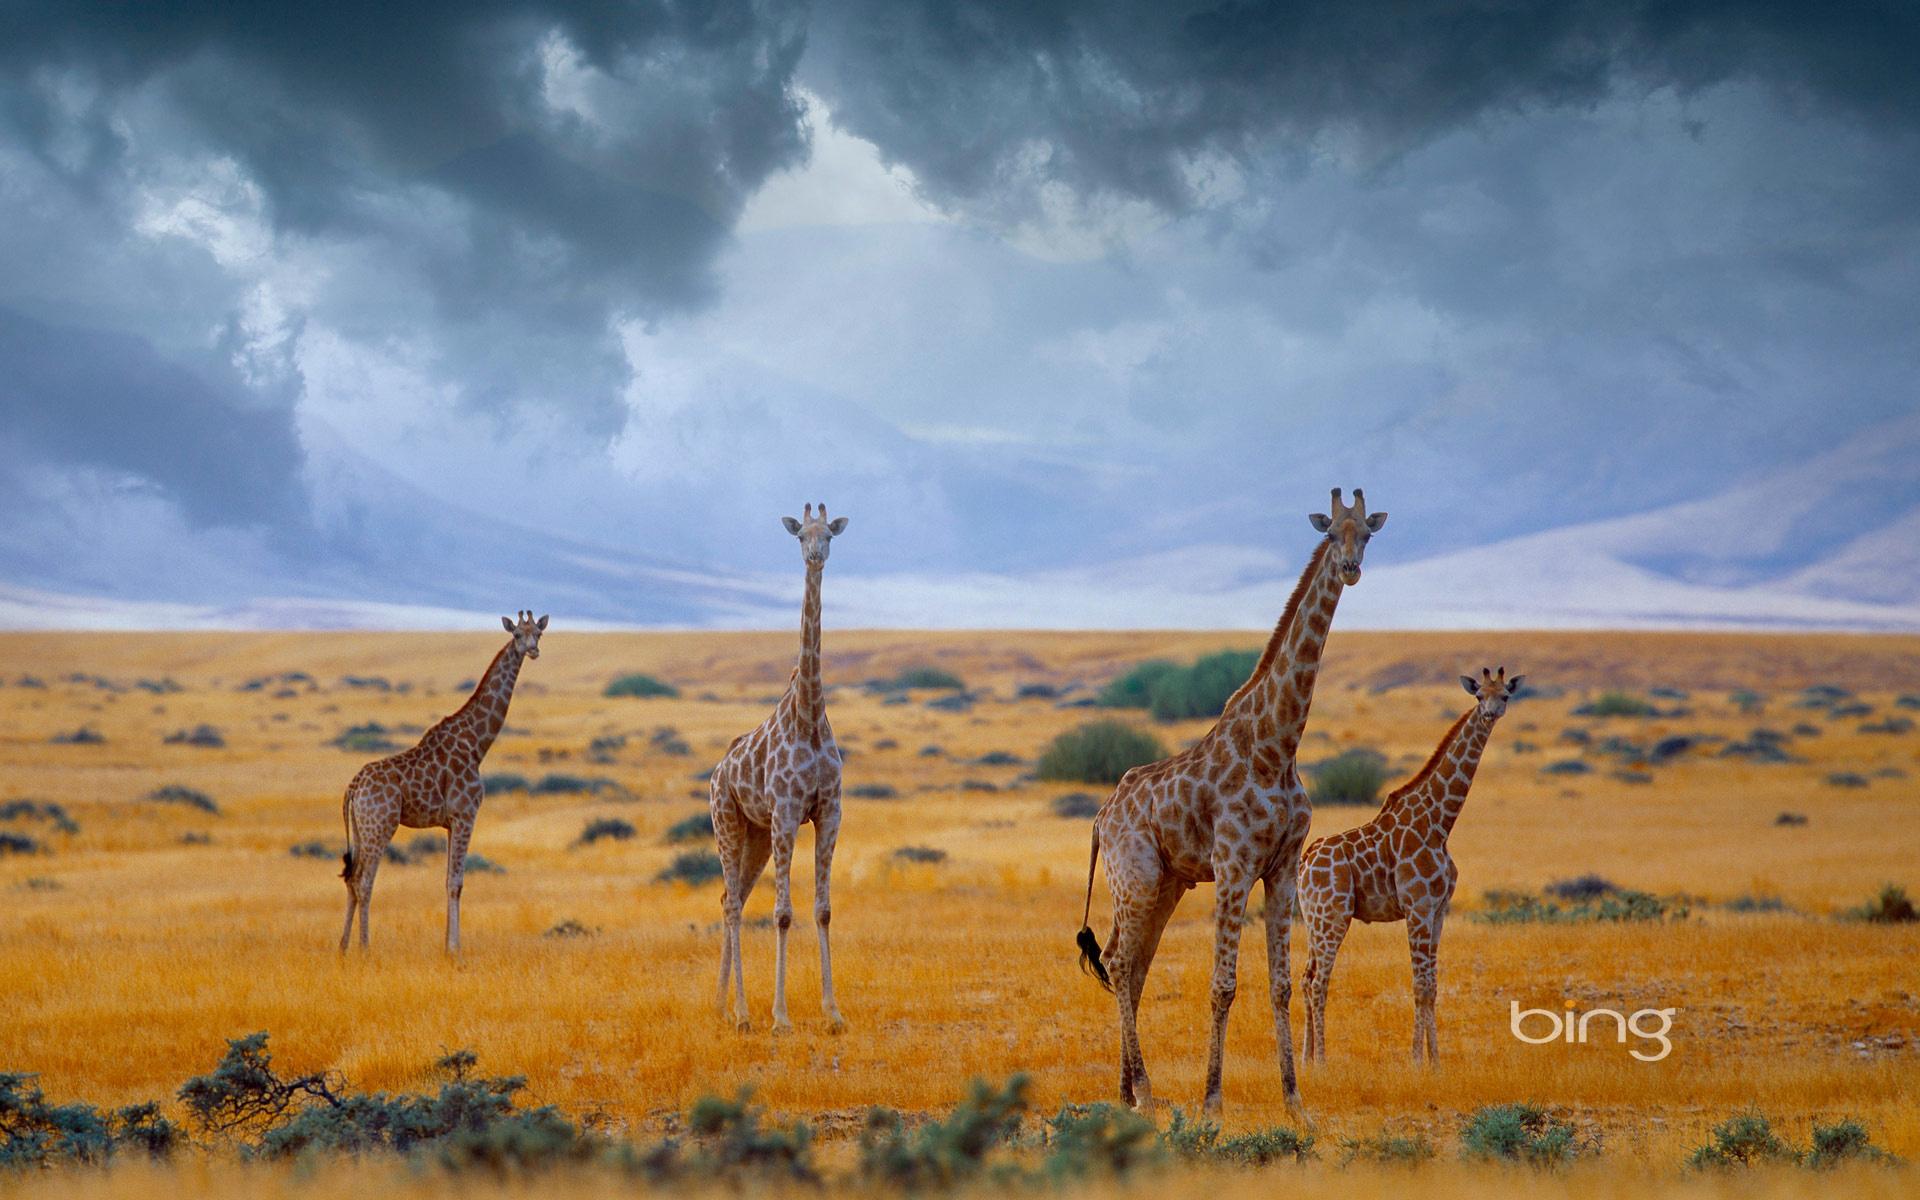 Thirsty Giraffes, Etosha National Park, Namibia  № 1442836 бесплатно